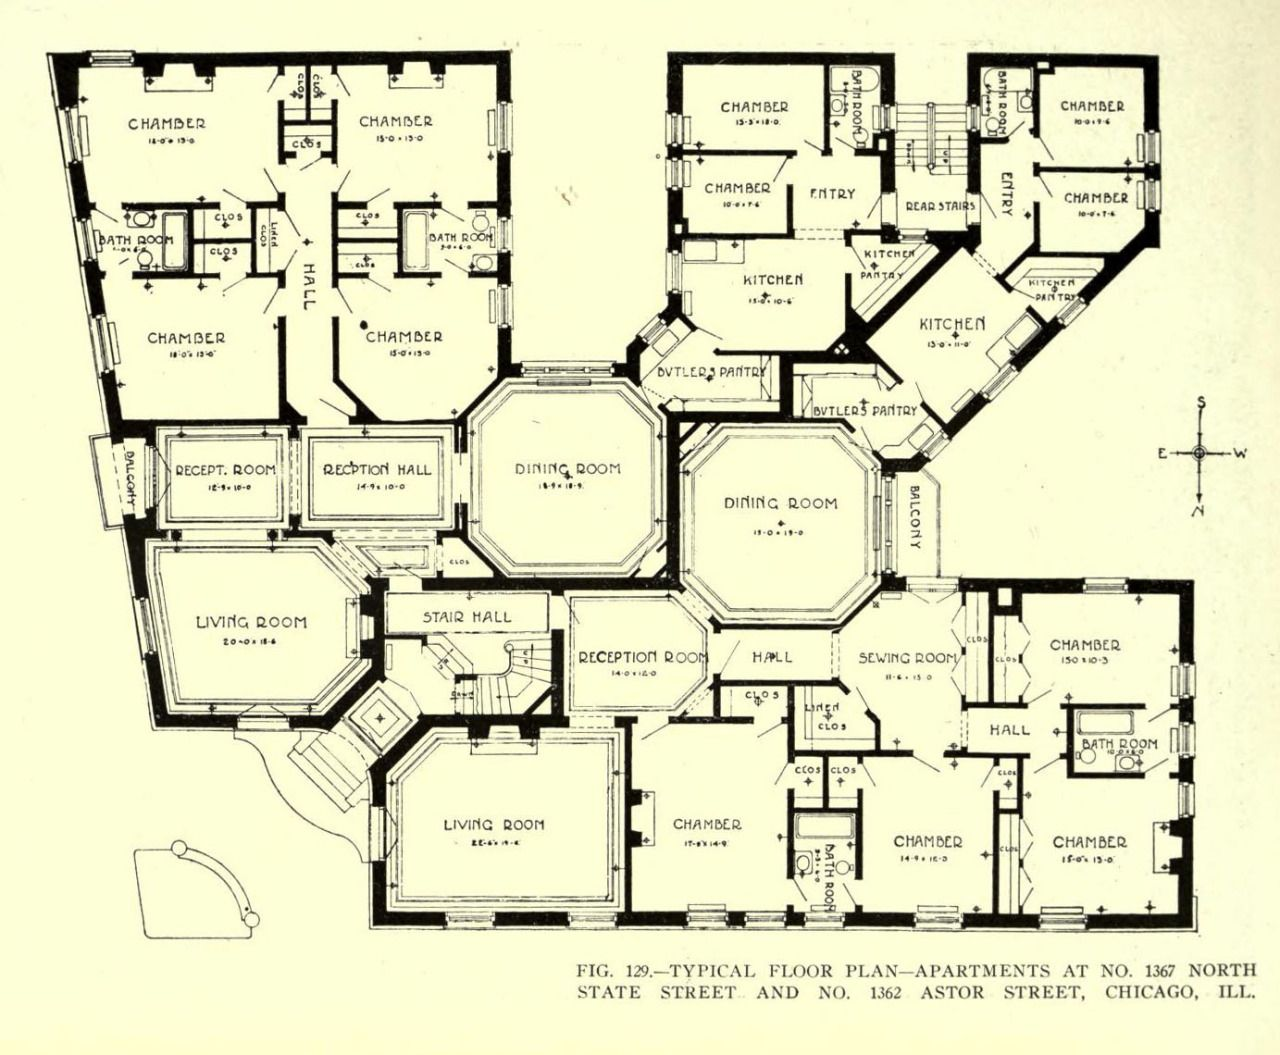 Chicago home blueprints home design plan floor plan for an apartment building chicago plans chicago home blueprints malvernweather Image collections